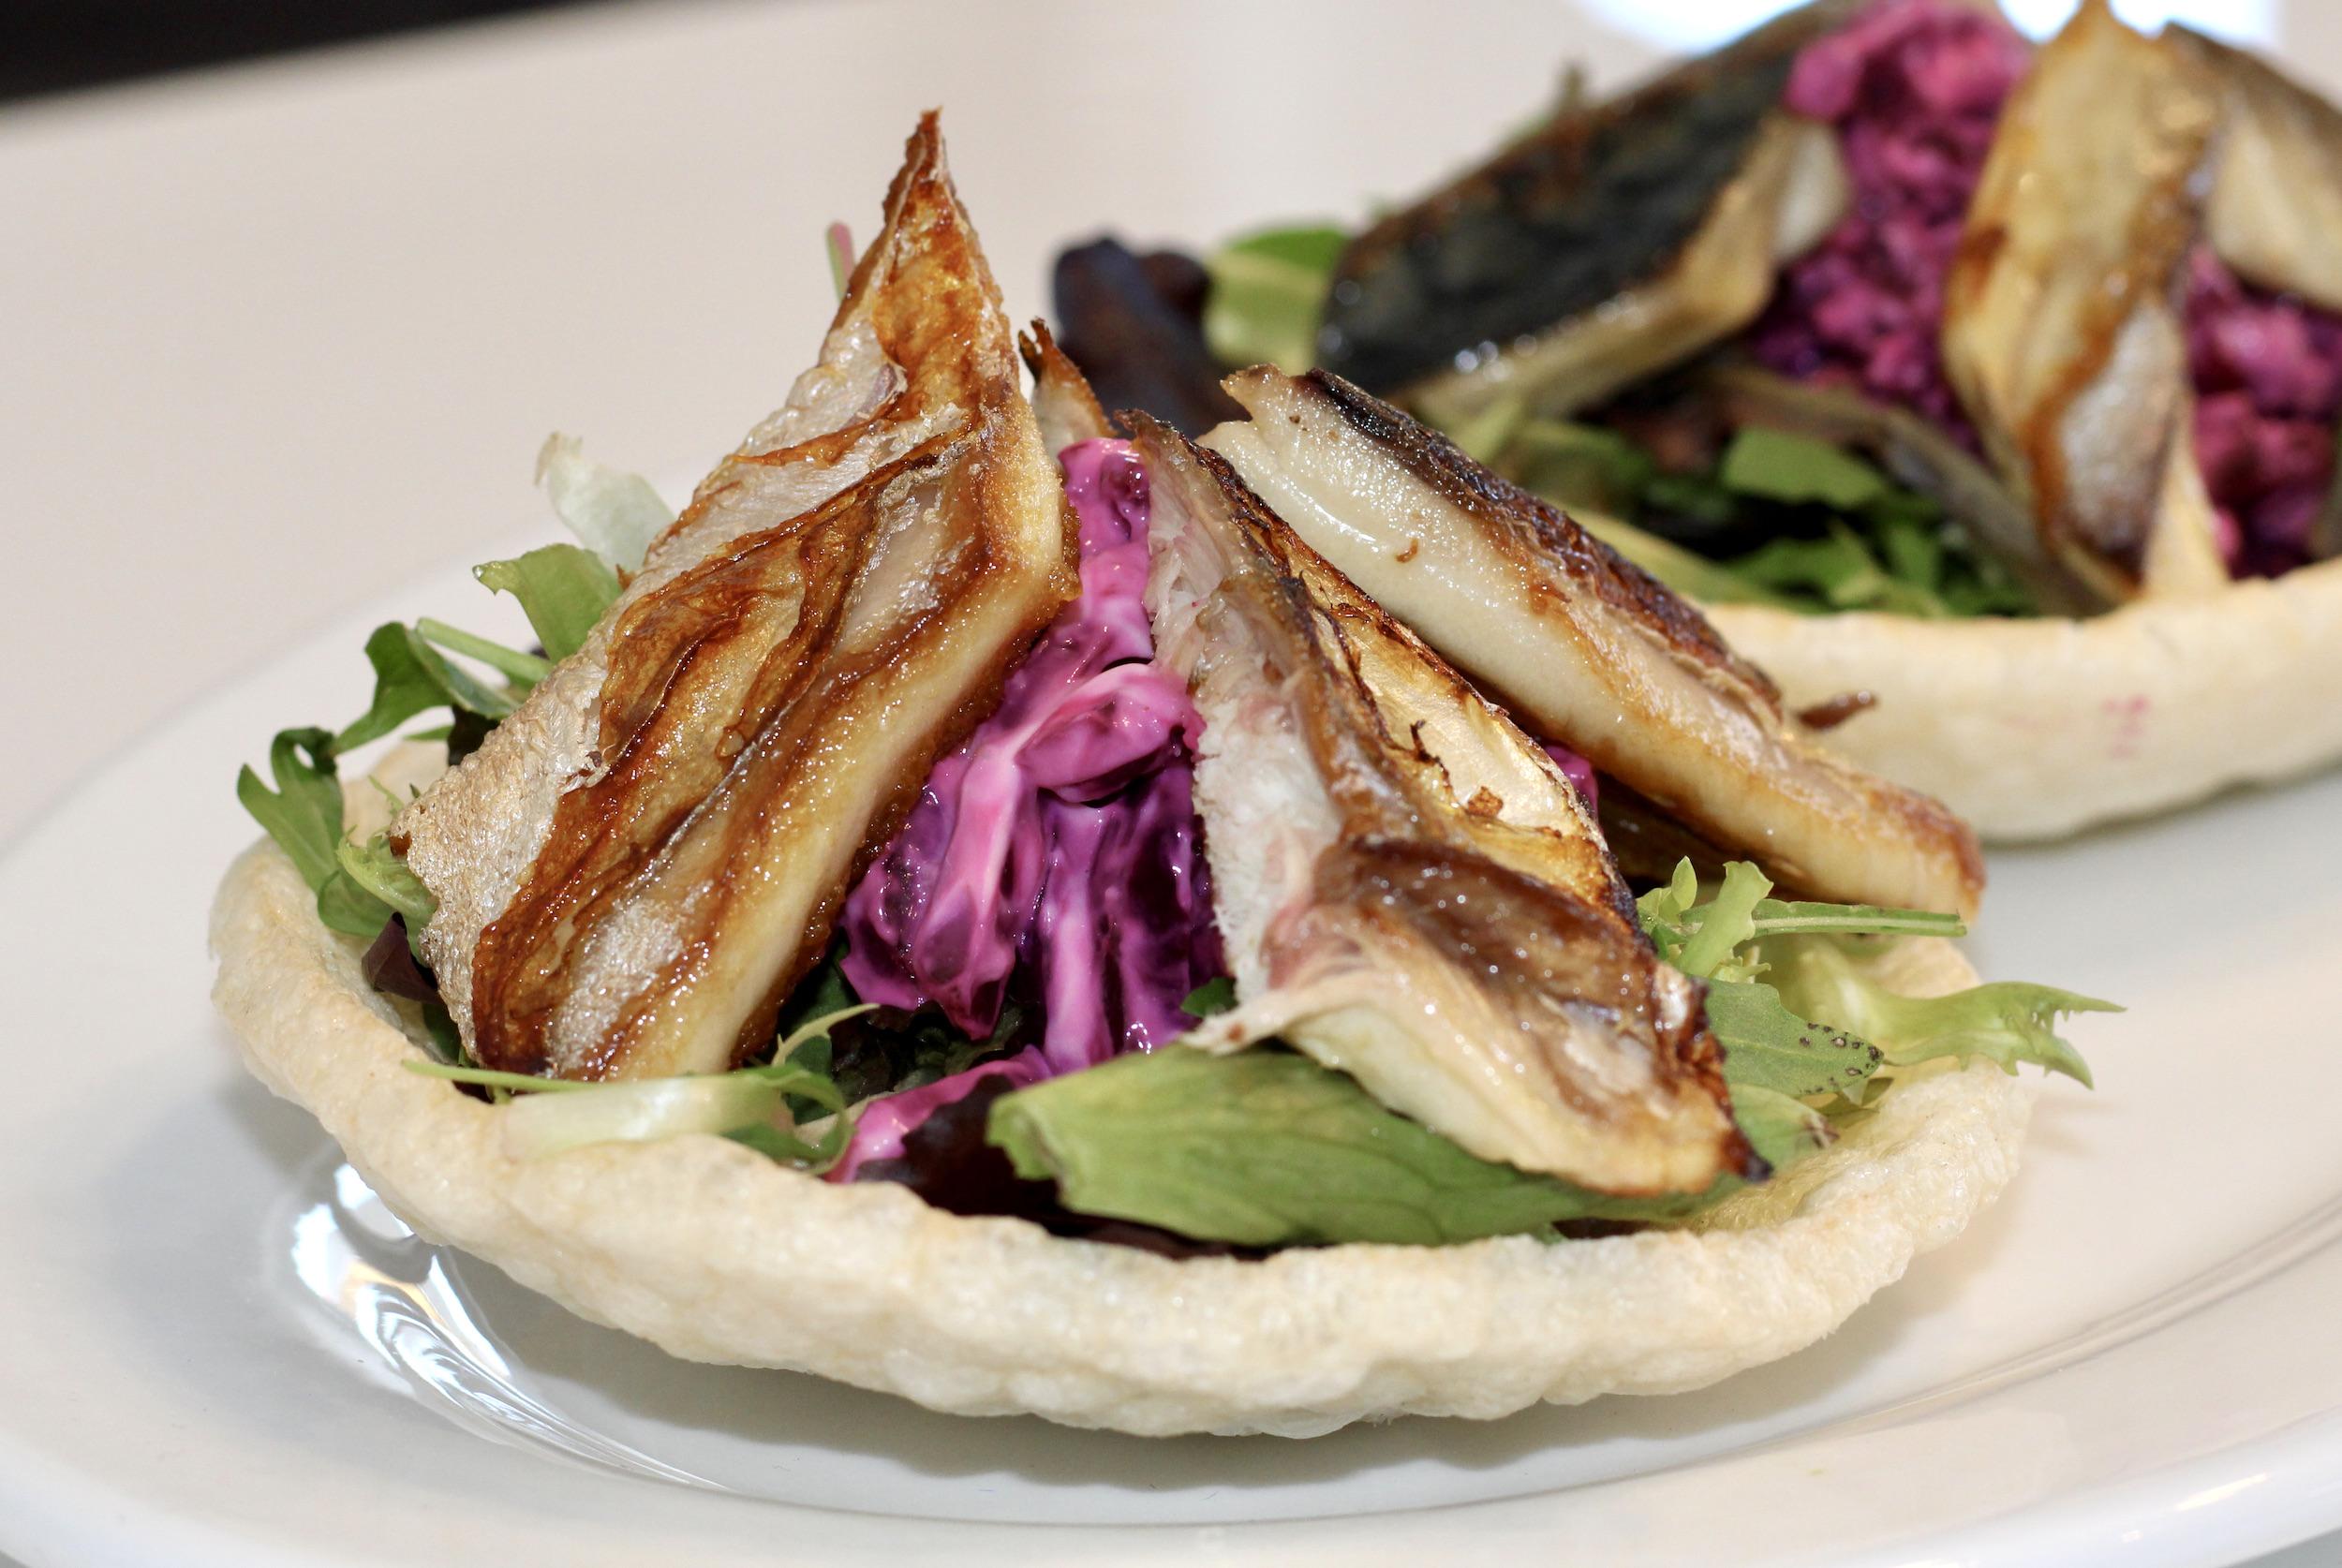 Mackerel & beetroot horseradish remoulade broghie